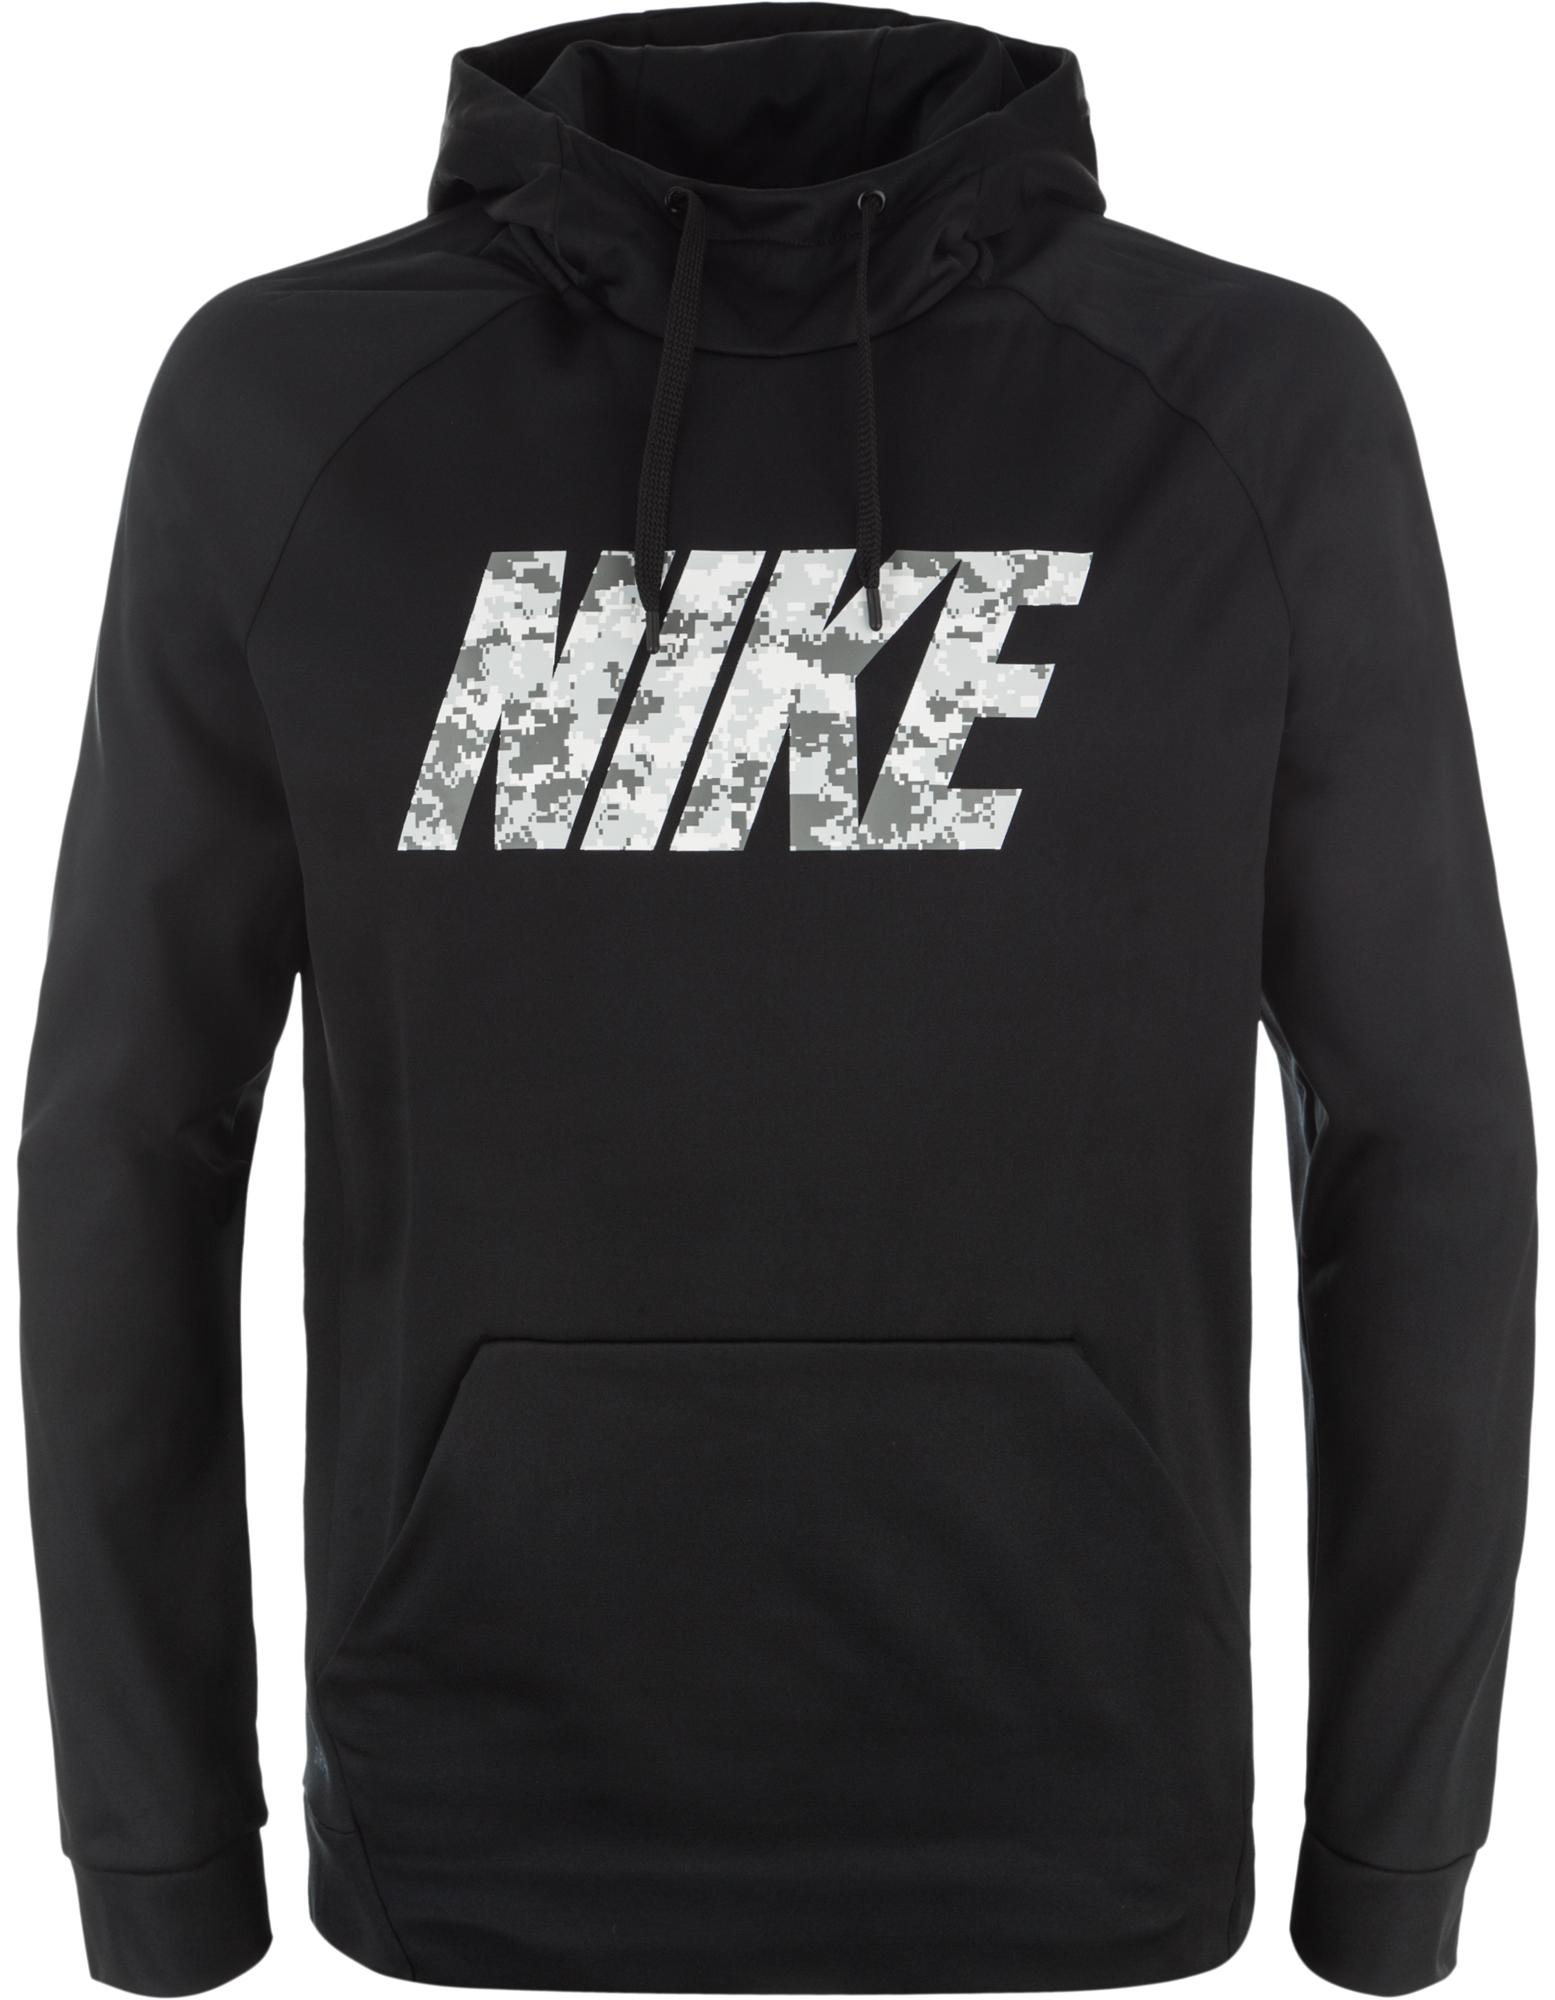 Nike Джемпер мужской Nike Therma джемпер мужской шерсть